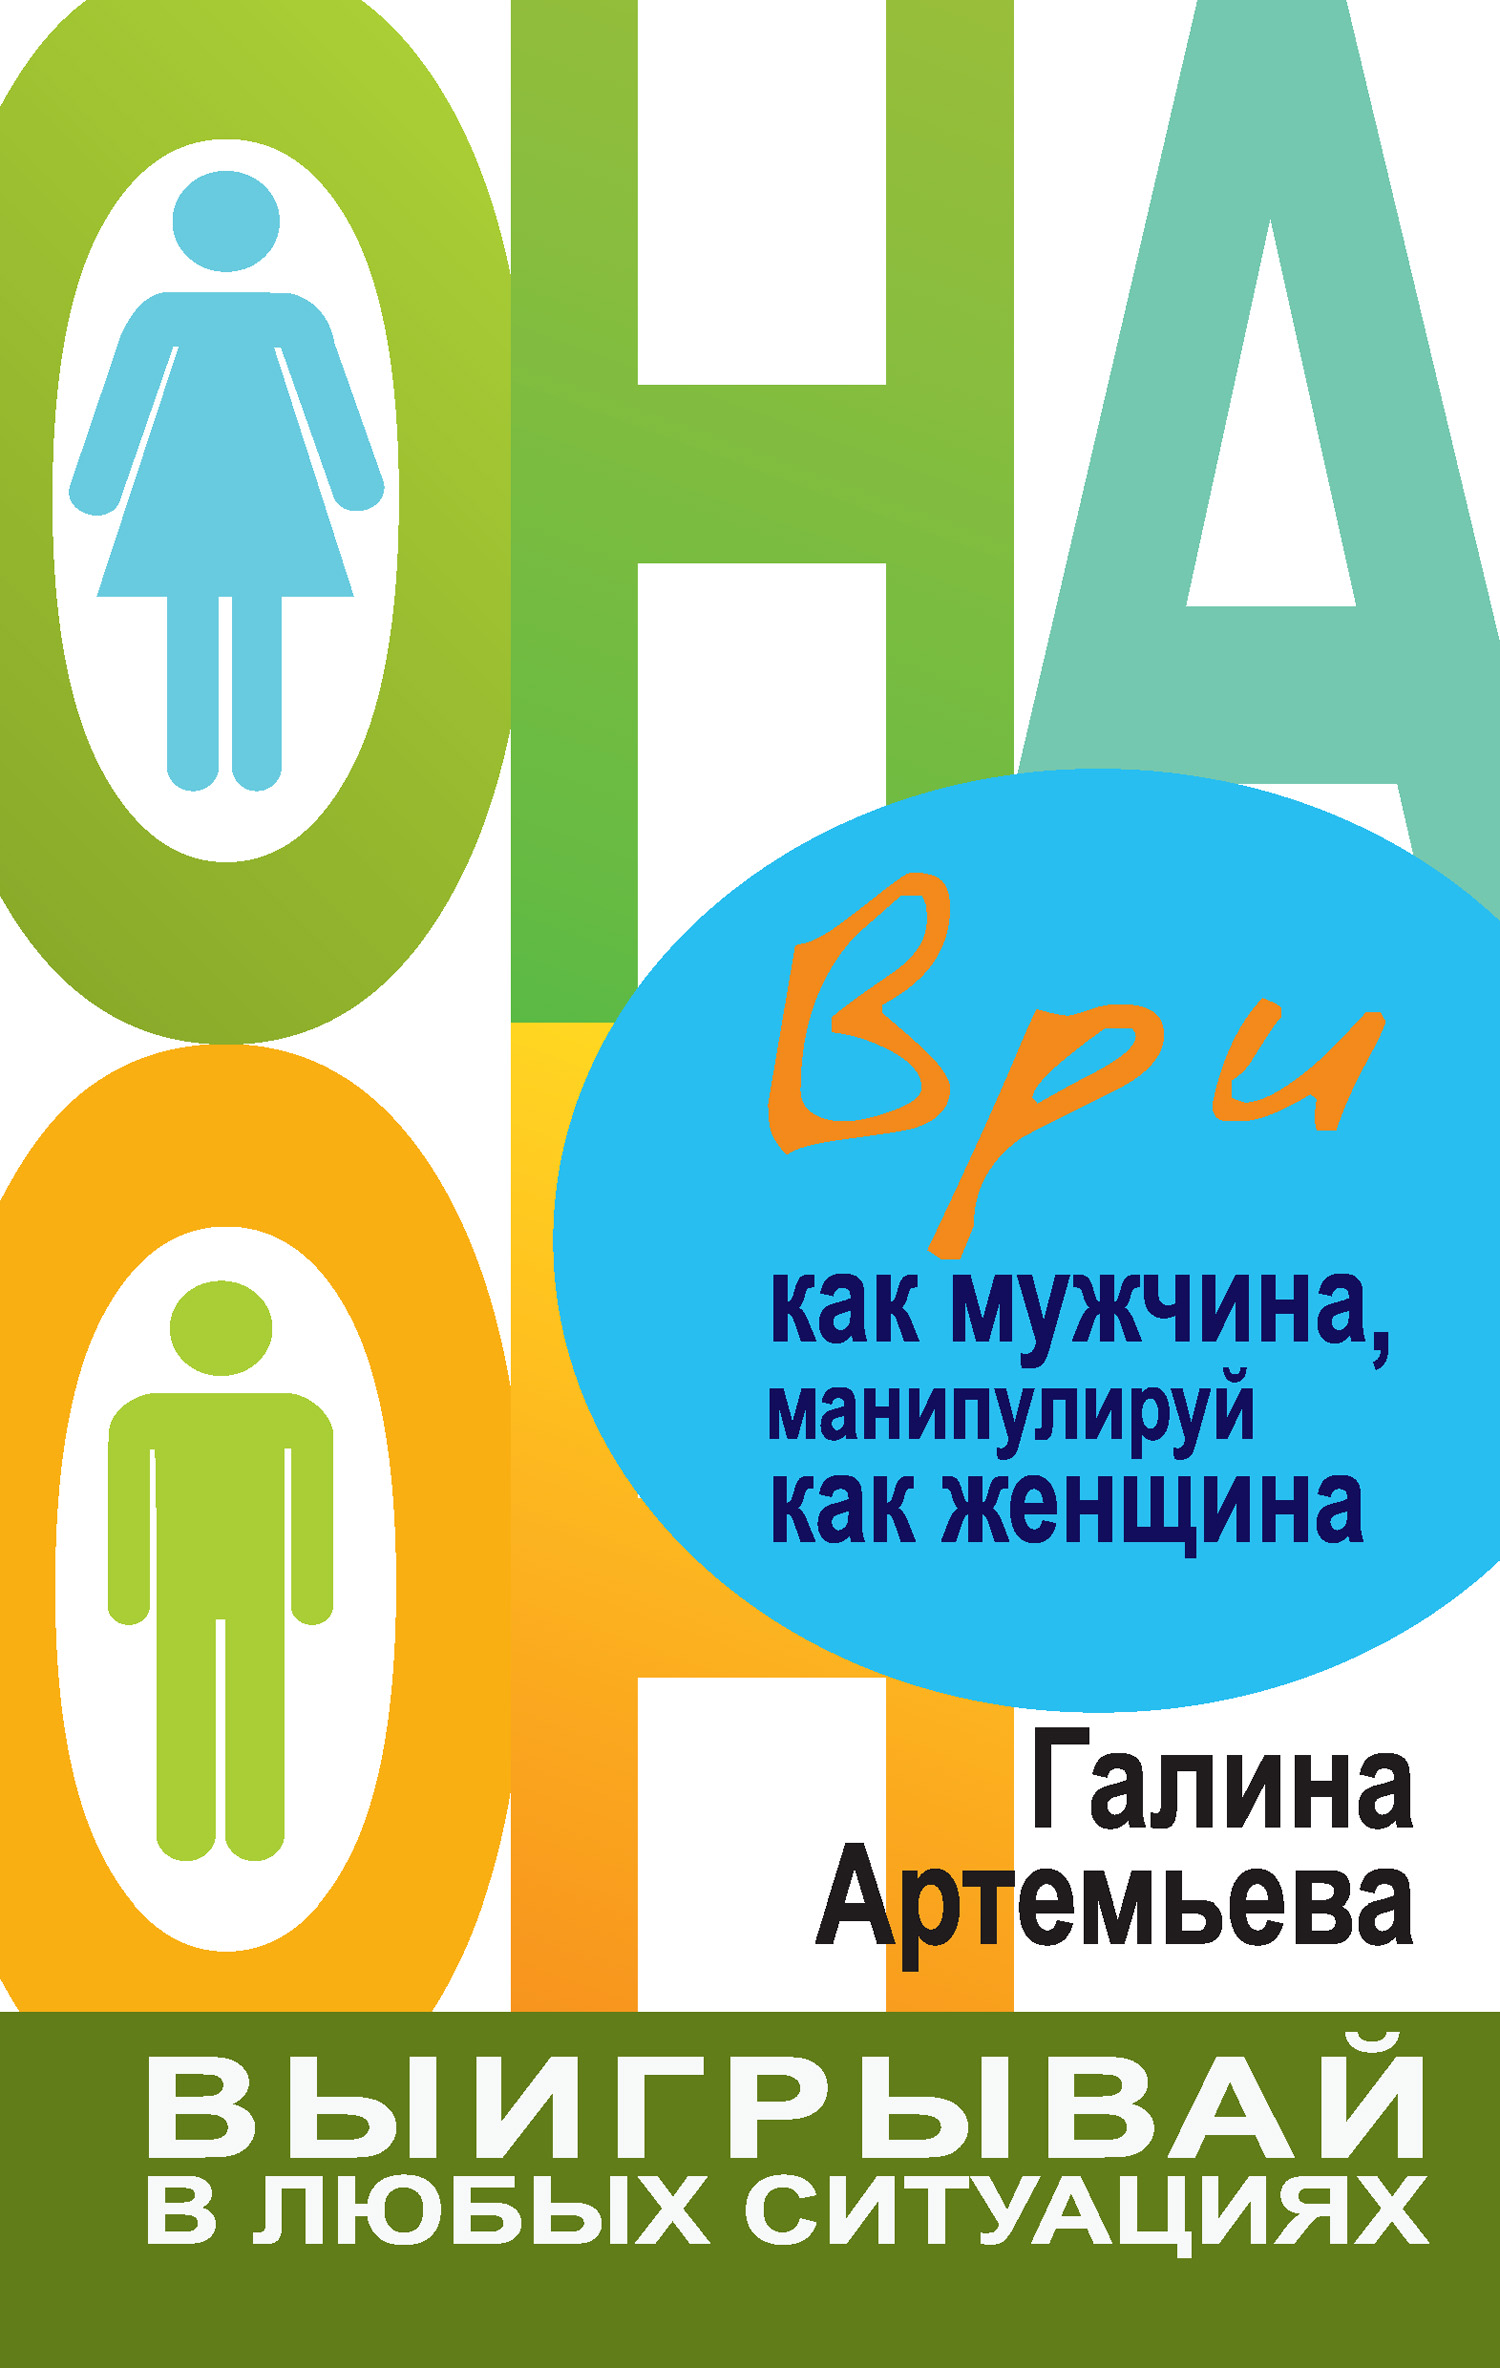 Галина Артемьева Ври как мужчина, манипулируй как женщина артемьева галина как взрослые люди